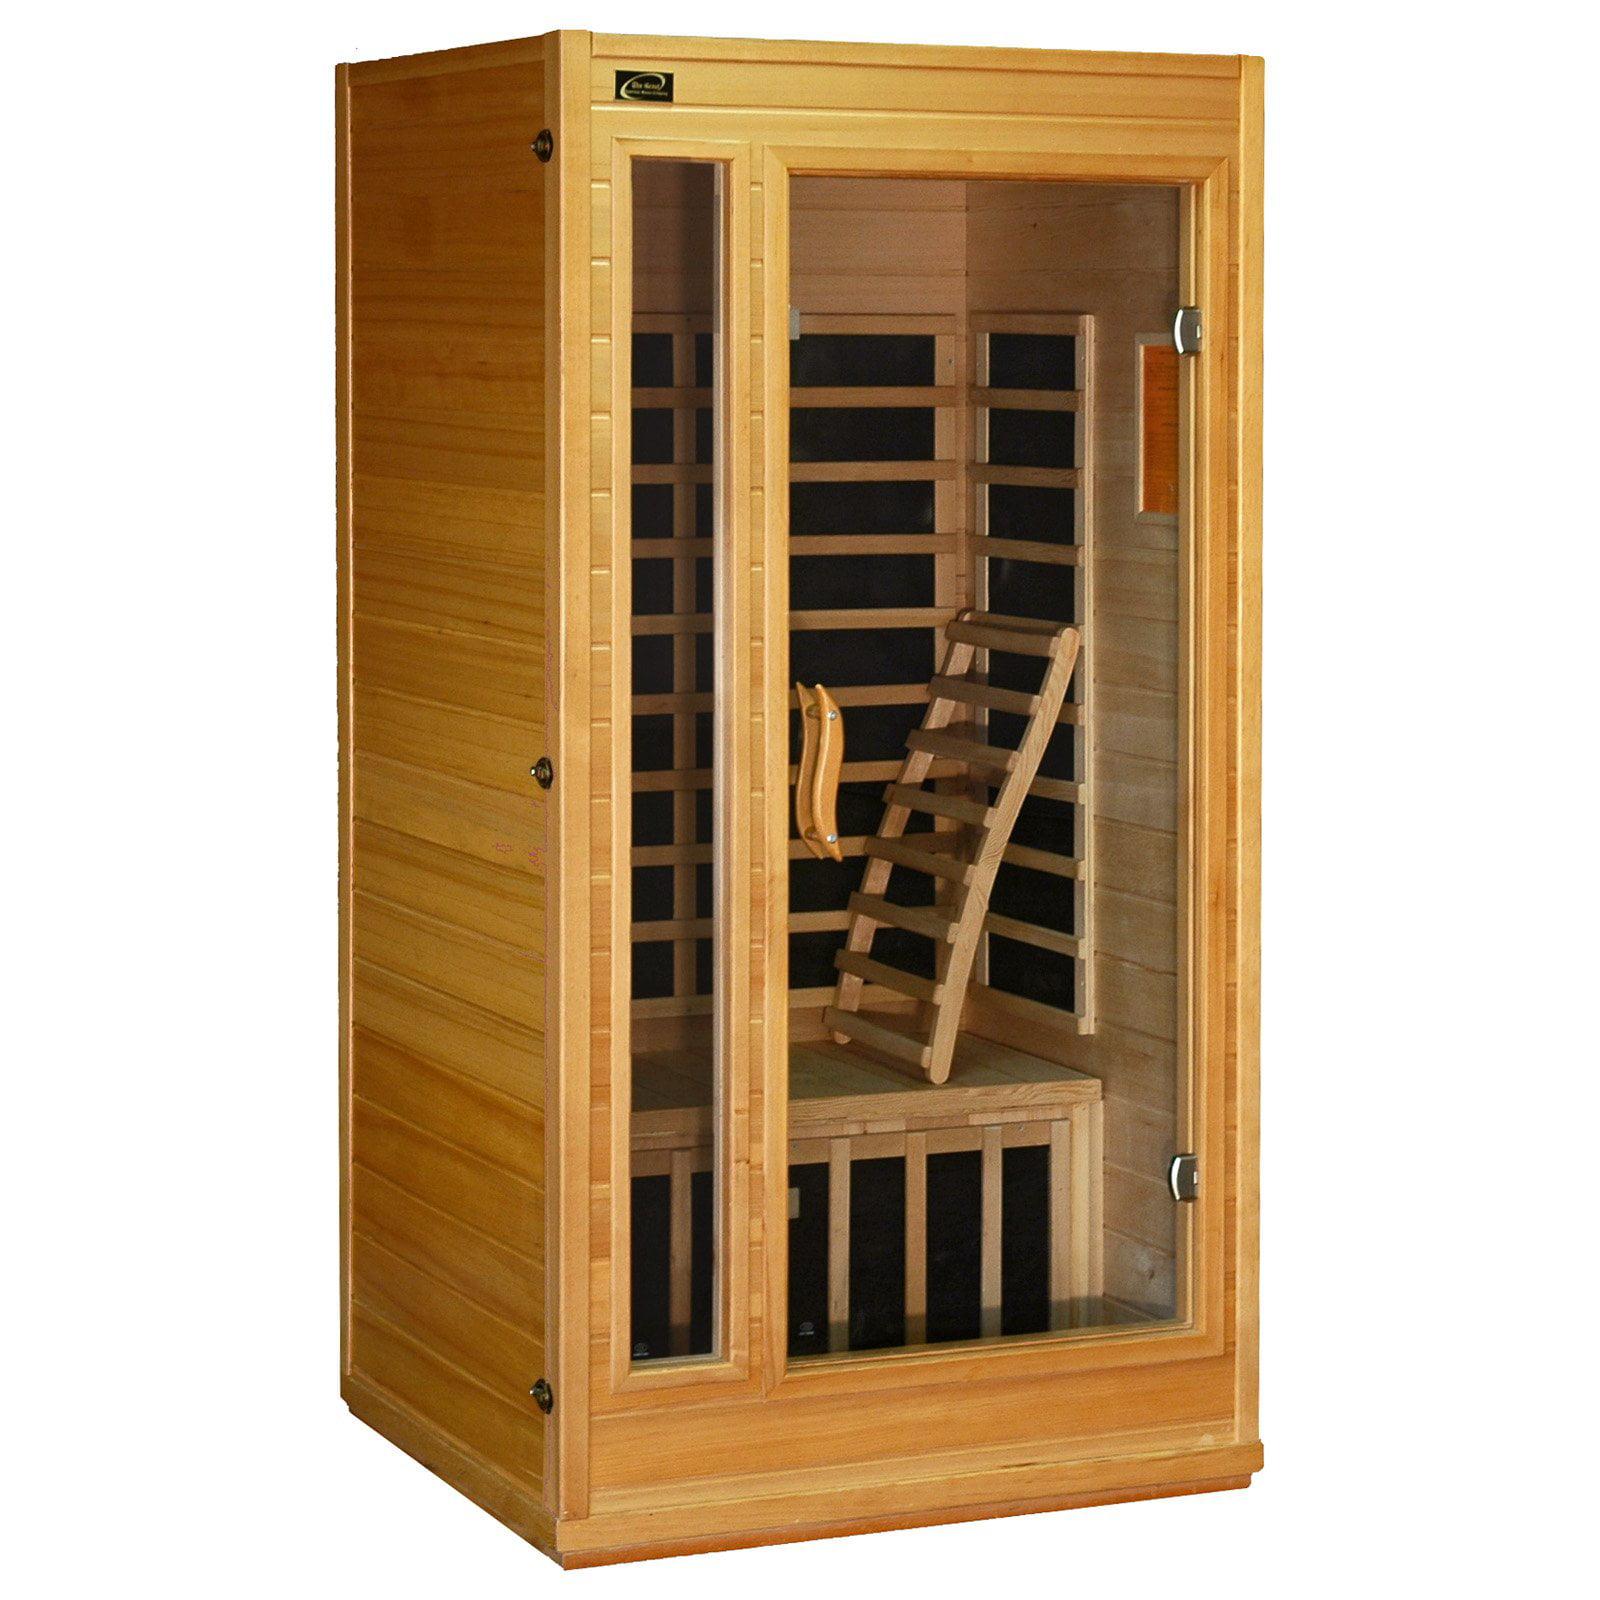 Great American Sauna Company 1-2 Person Sauna